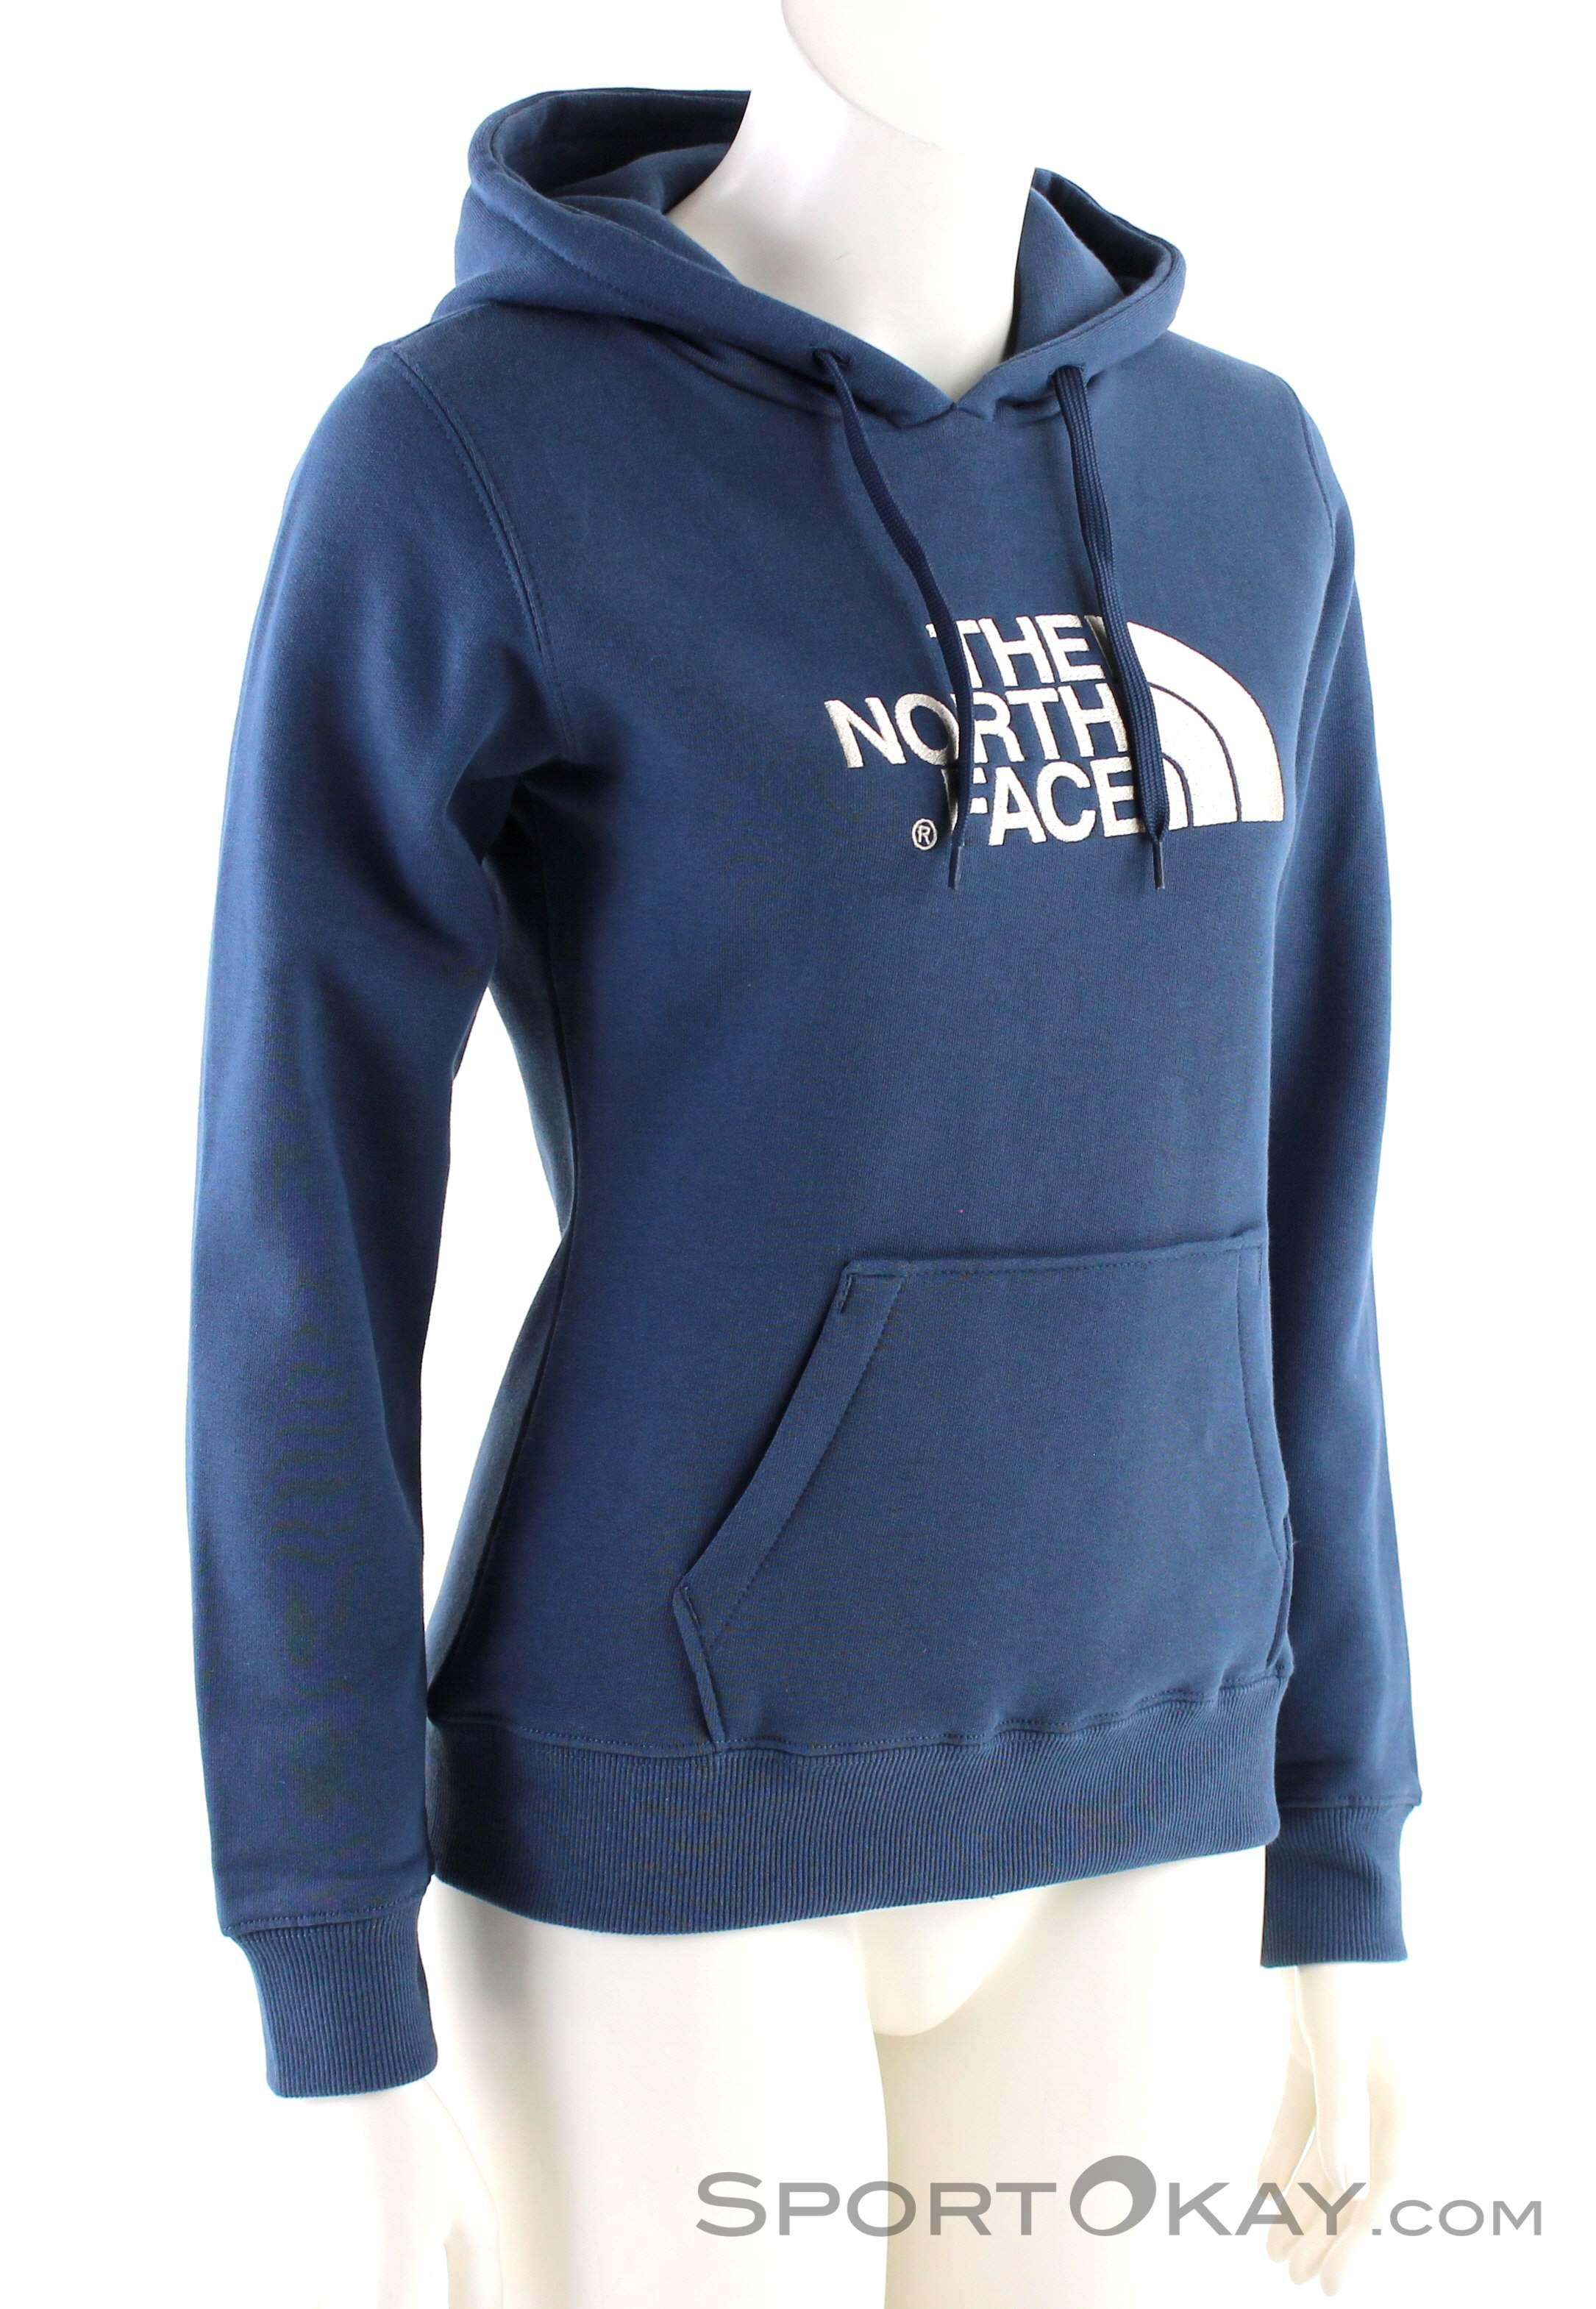 bebb77dc043 The North Face W Drew Peak Pull HD Womens Sweater - Sweaters ...